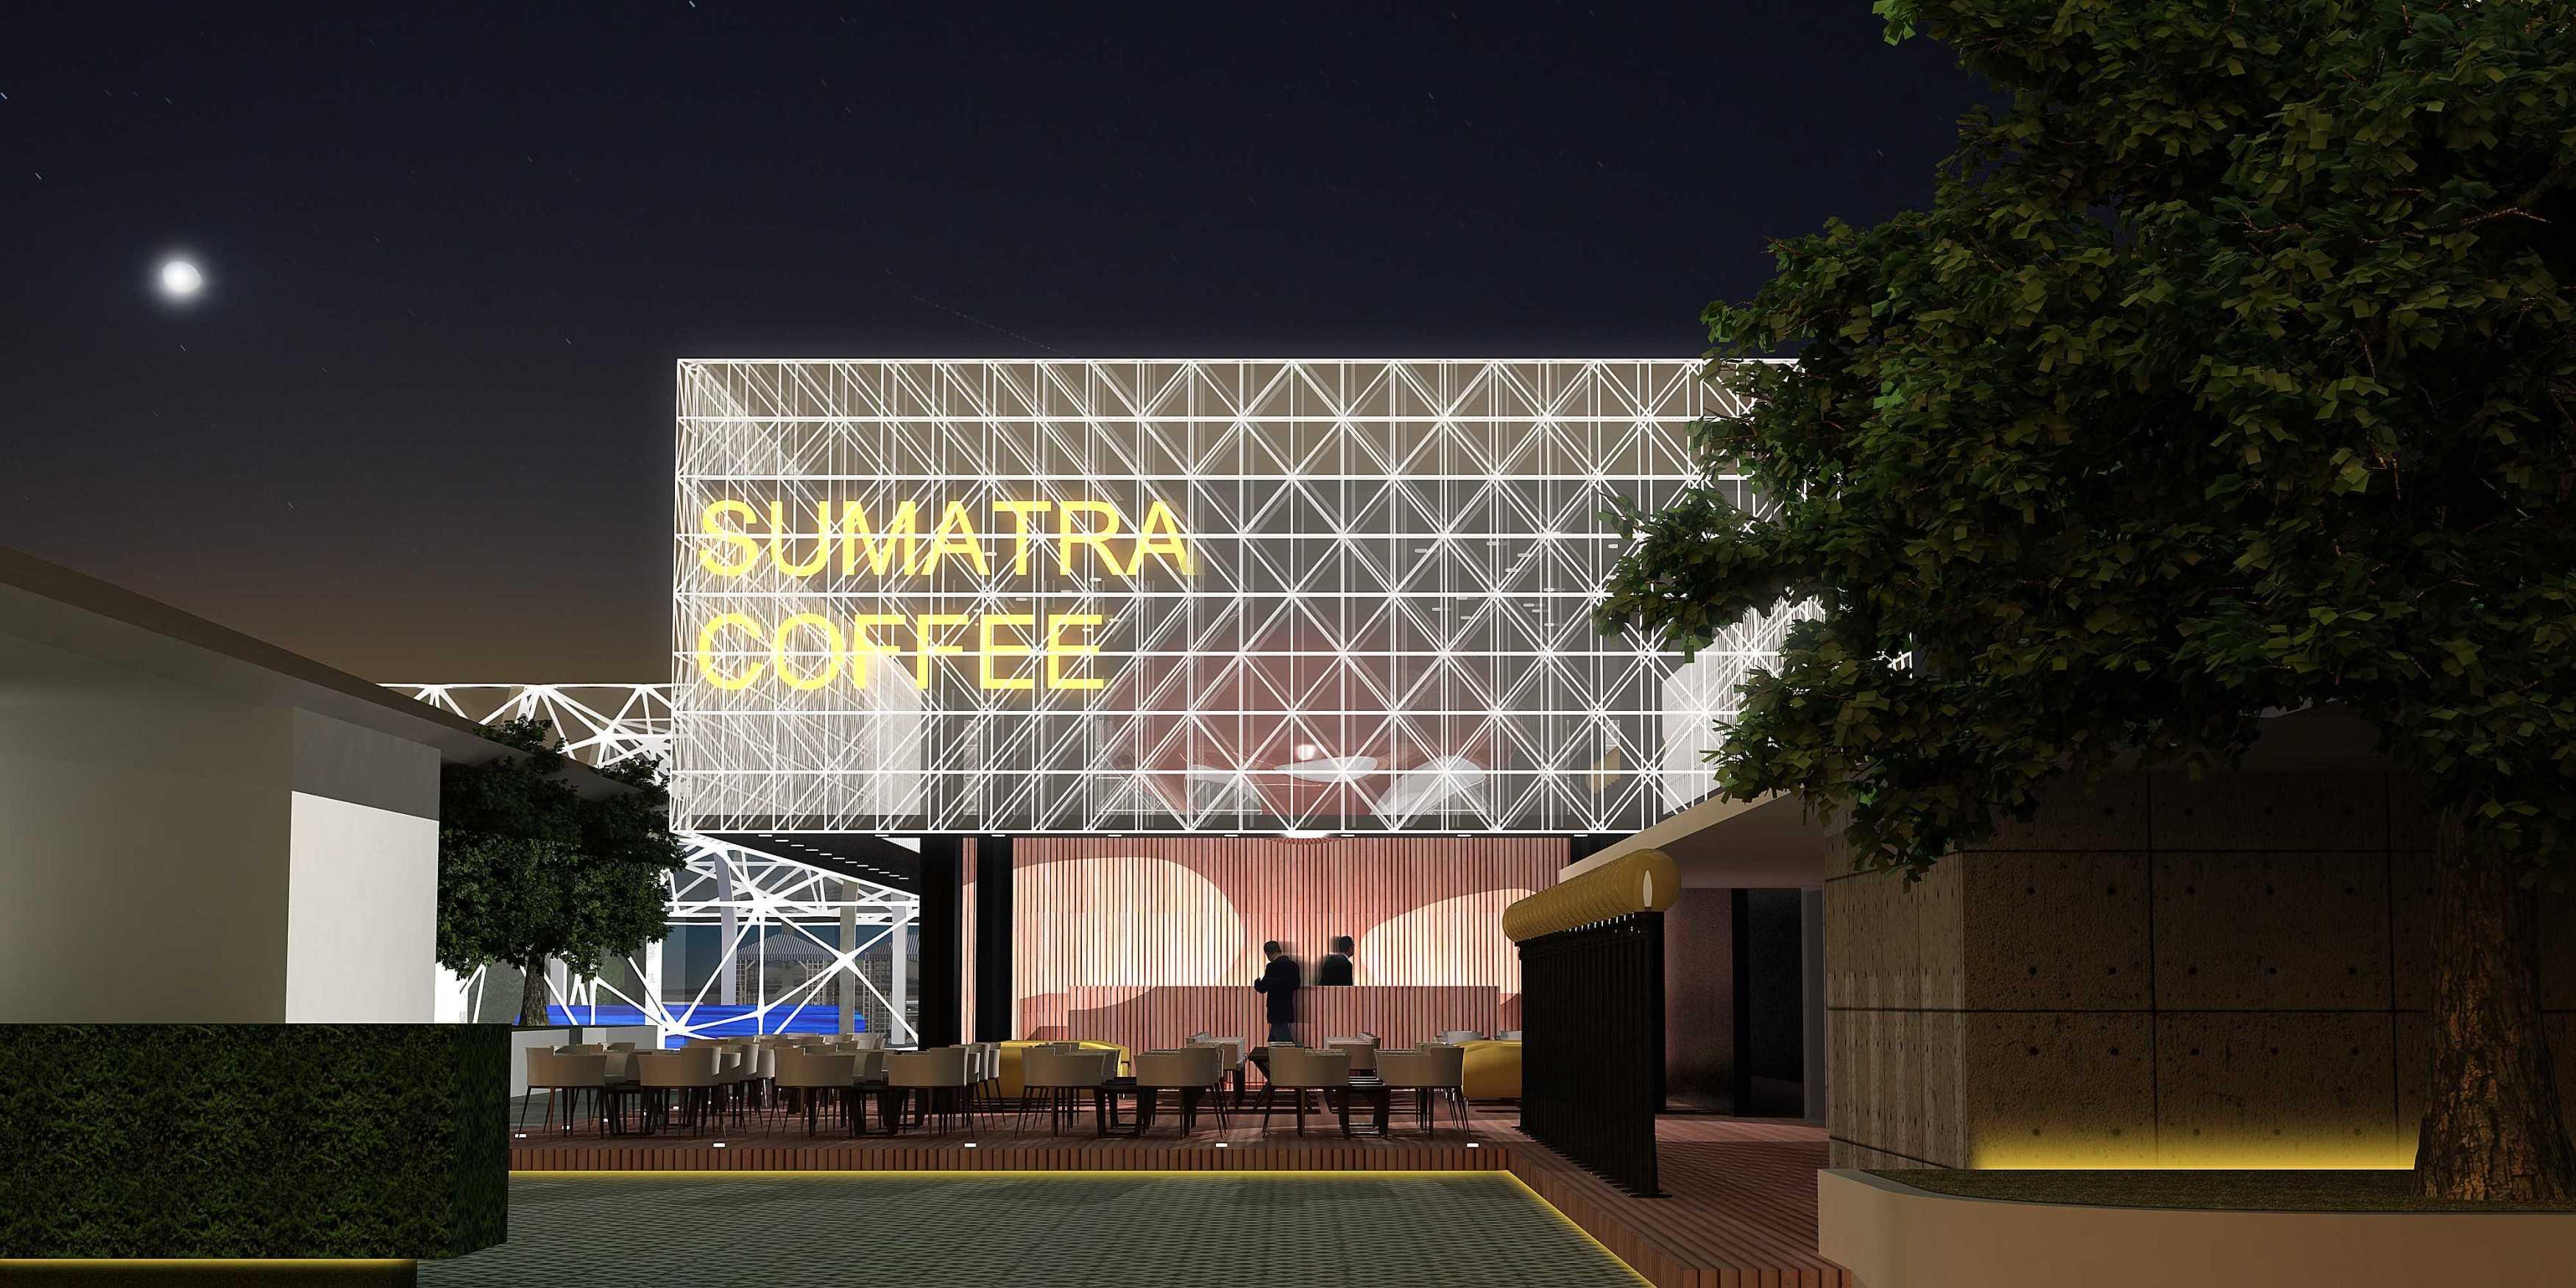 Eapstudio Sumatra Coffee Surabaya, Kota Sby, Jawa Timur, Indonesia Surabaya, Kota Sby, Jawa Timur, Indonesia Eapstudio-Sumatra-Coffee   121252